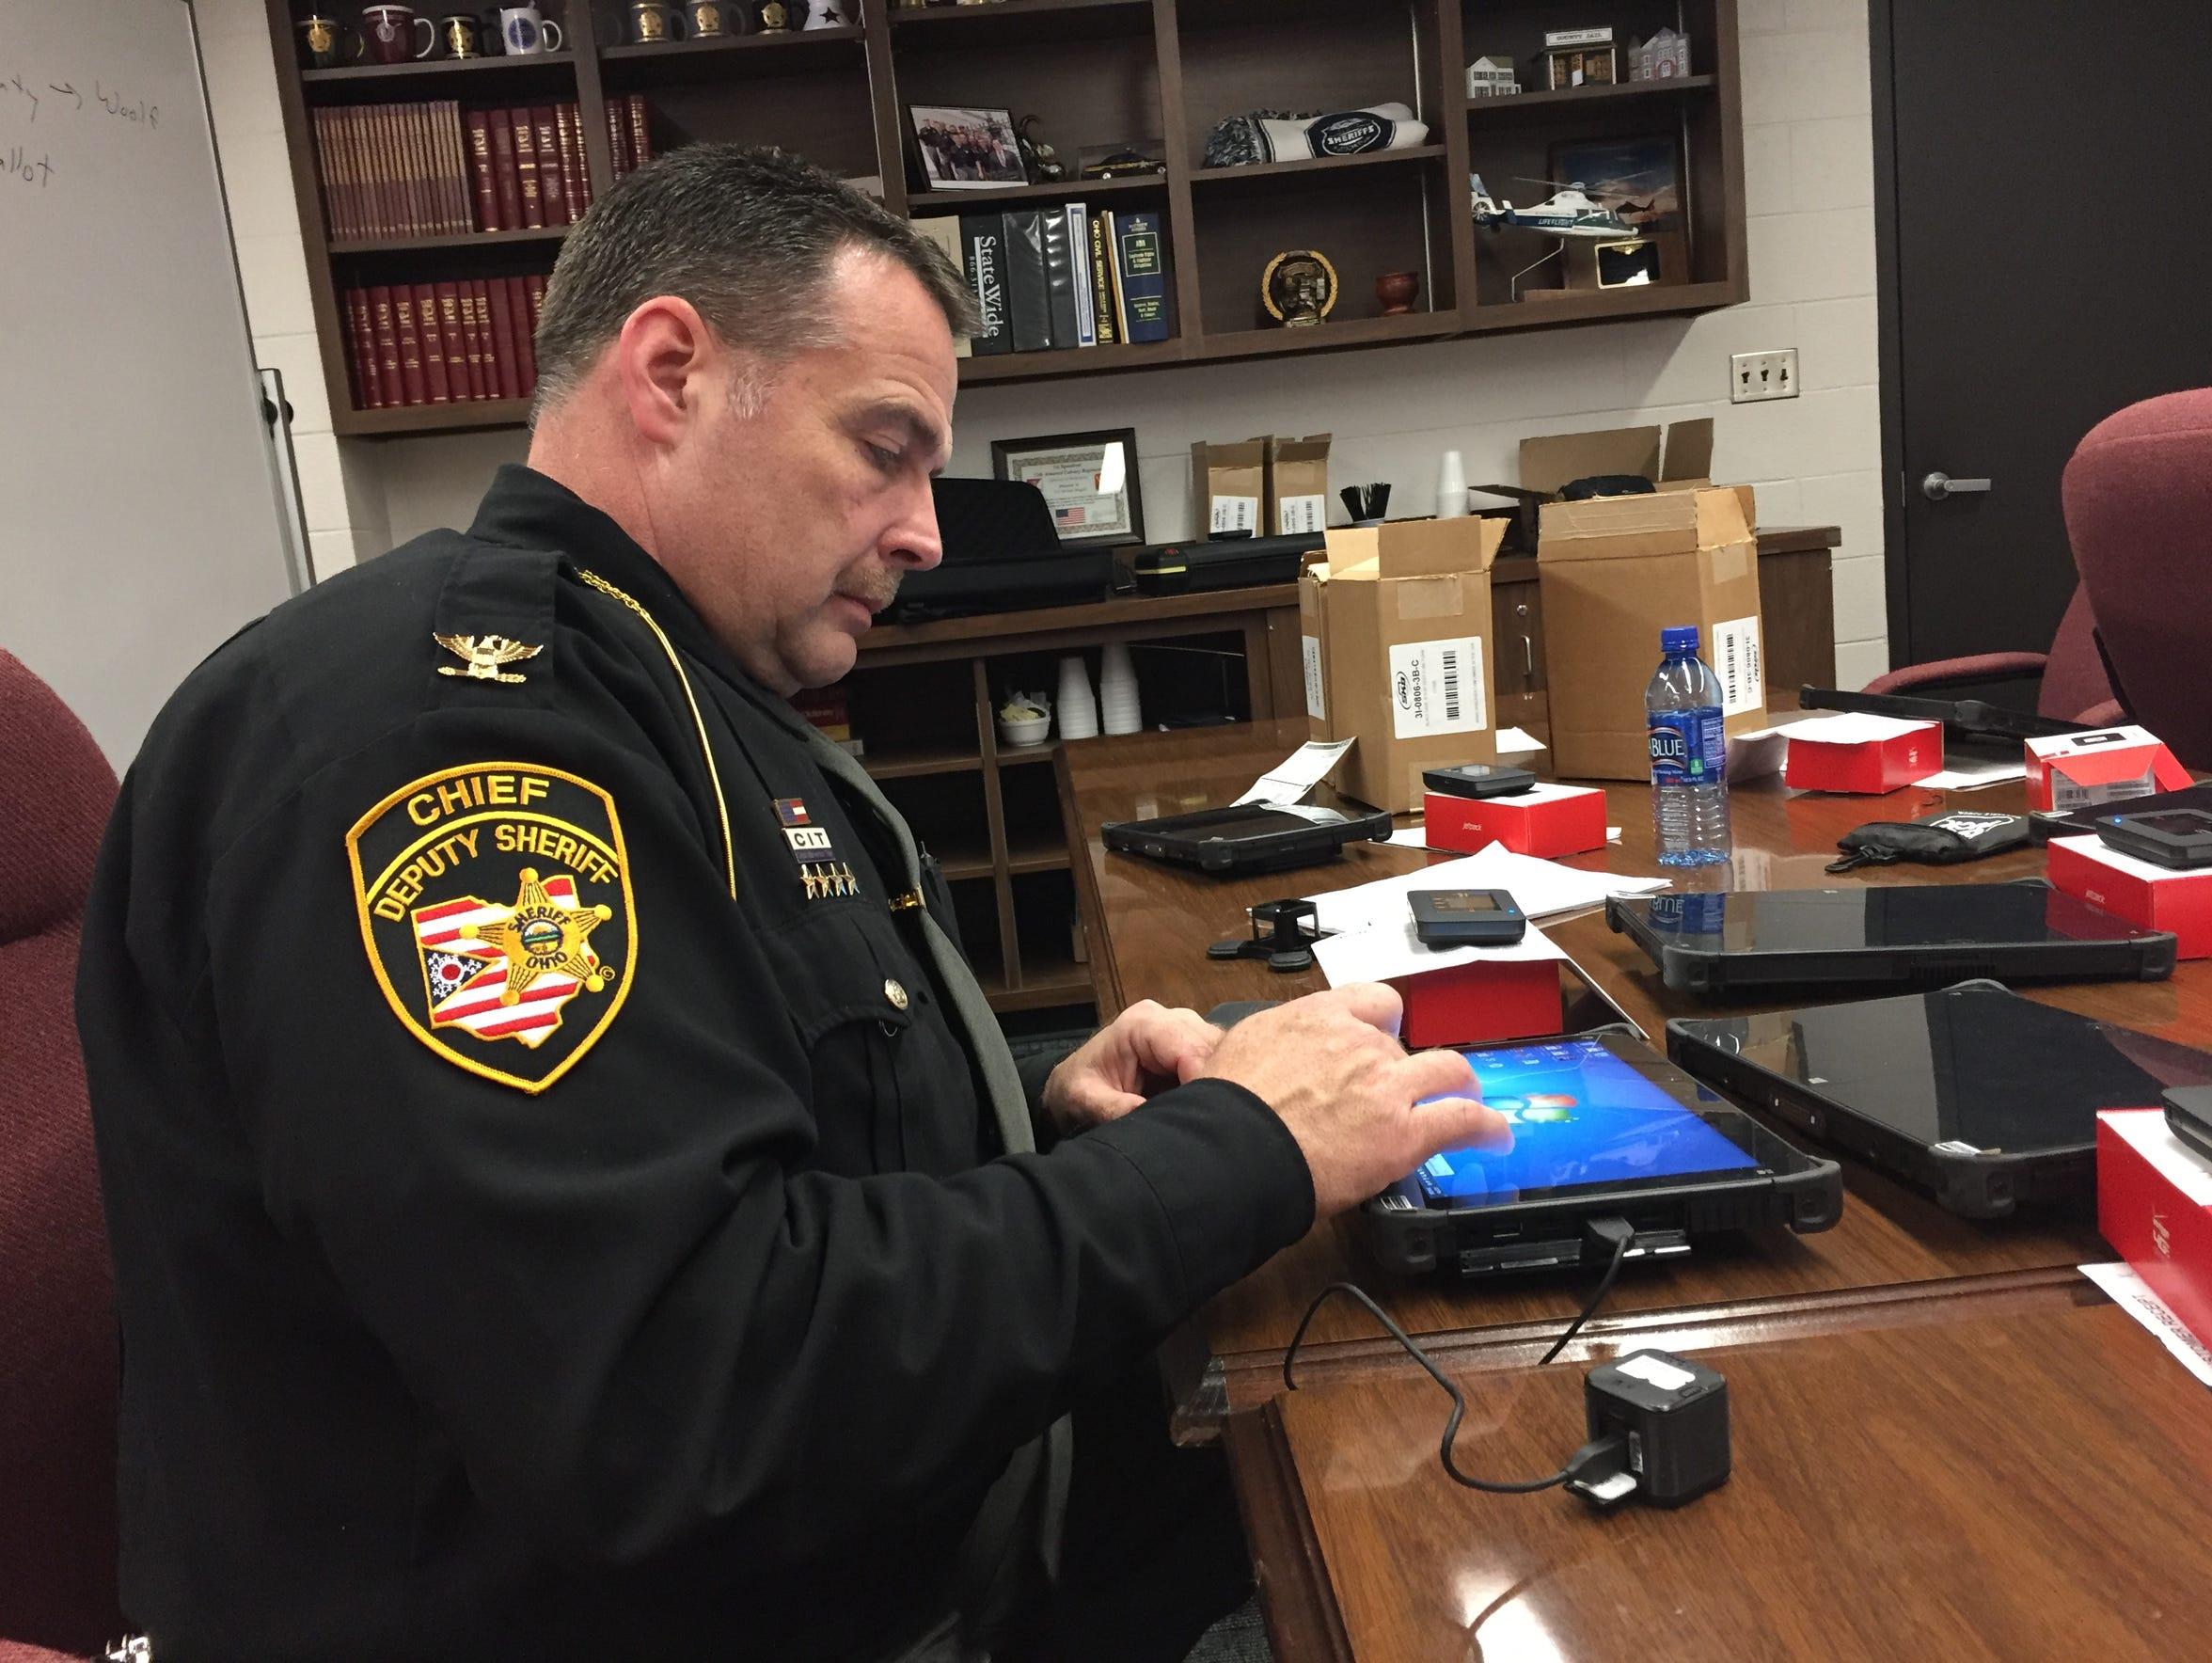 Sandusky County Chief Deputy Ed Hastings demonstrates